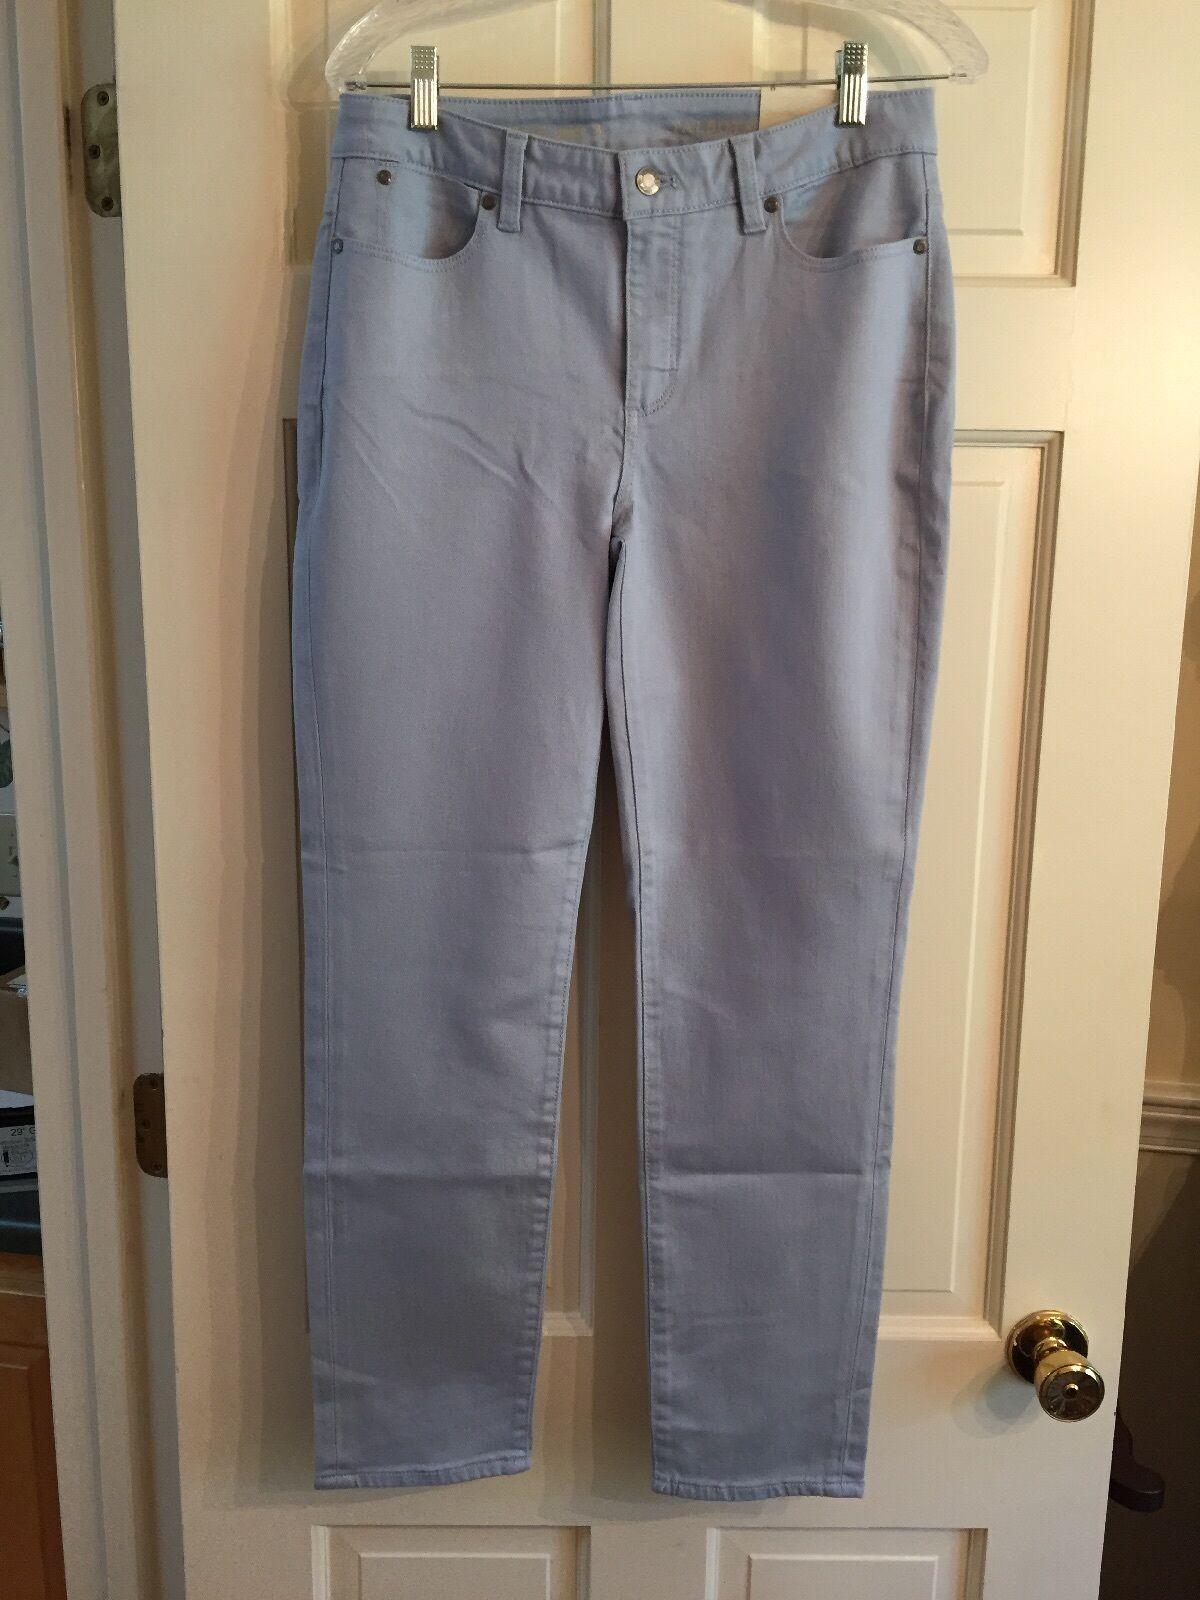 NWT Talbots Heritage Ankle Jeans blå Aura Misses Storlek 8  79.50